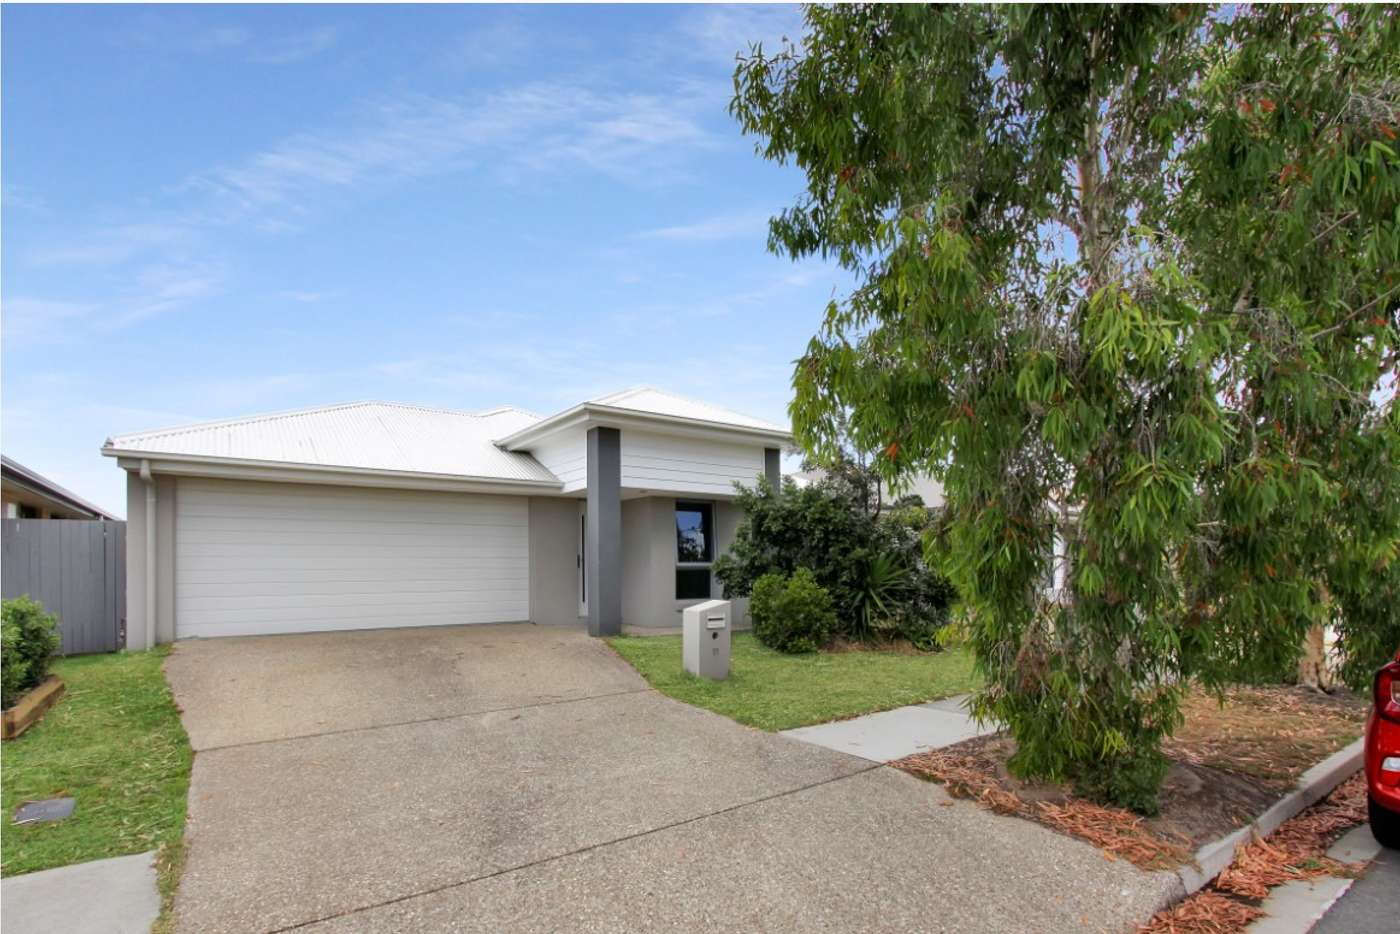 Main view of Homely house listing, 11 Bernard Circuit, Yarrabilba QLD 4207